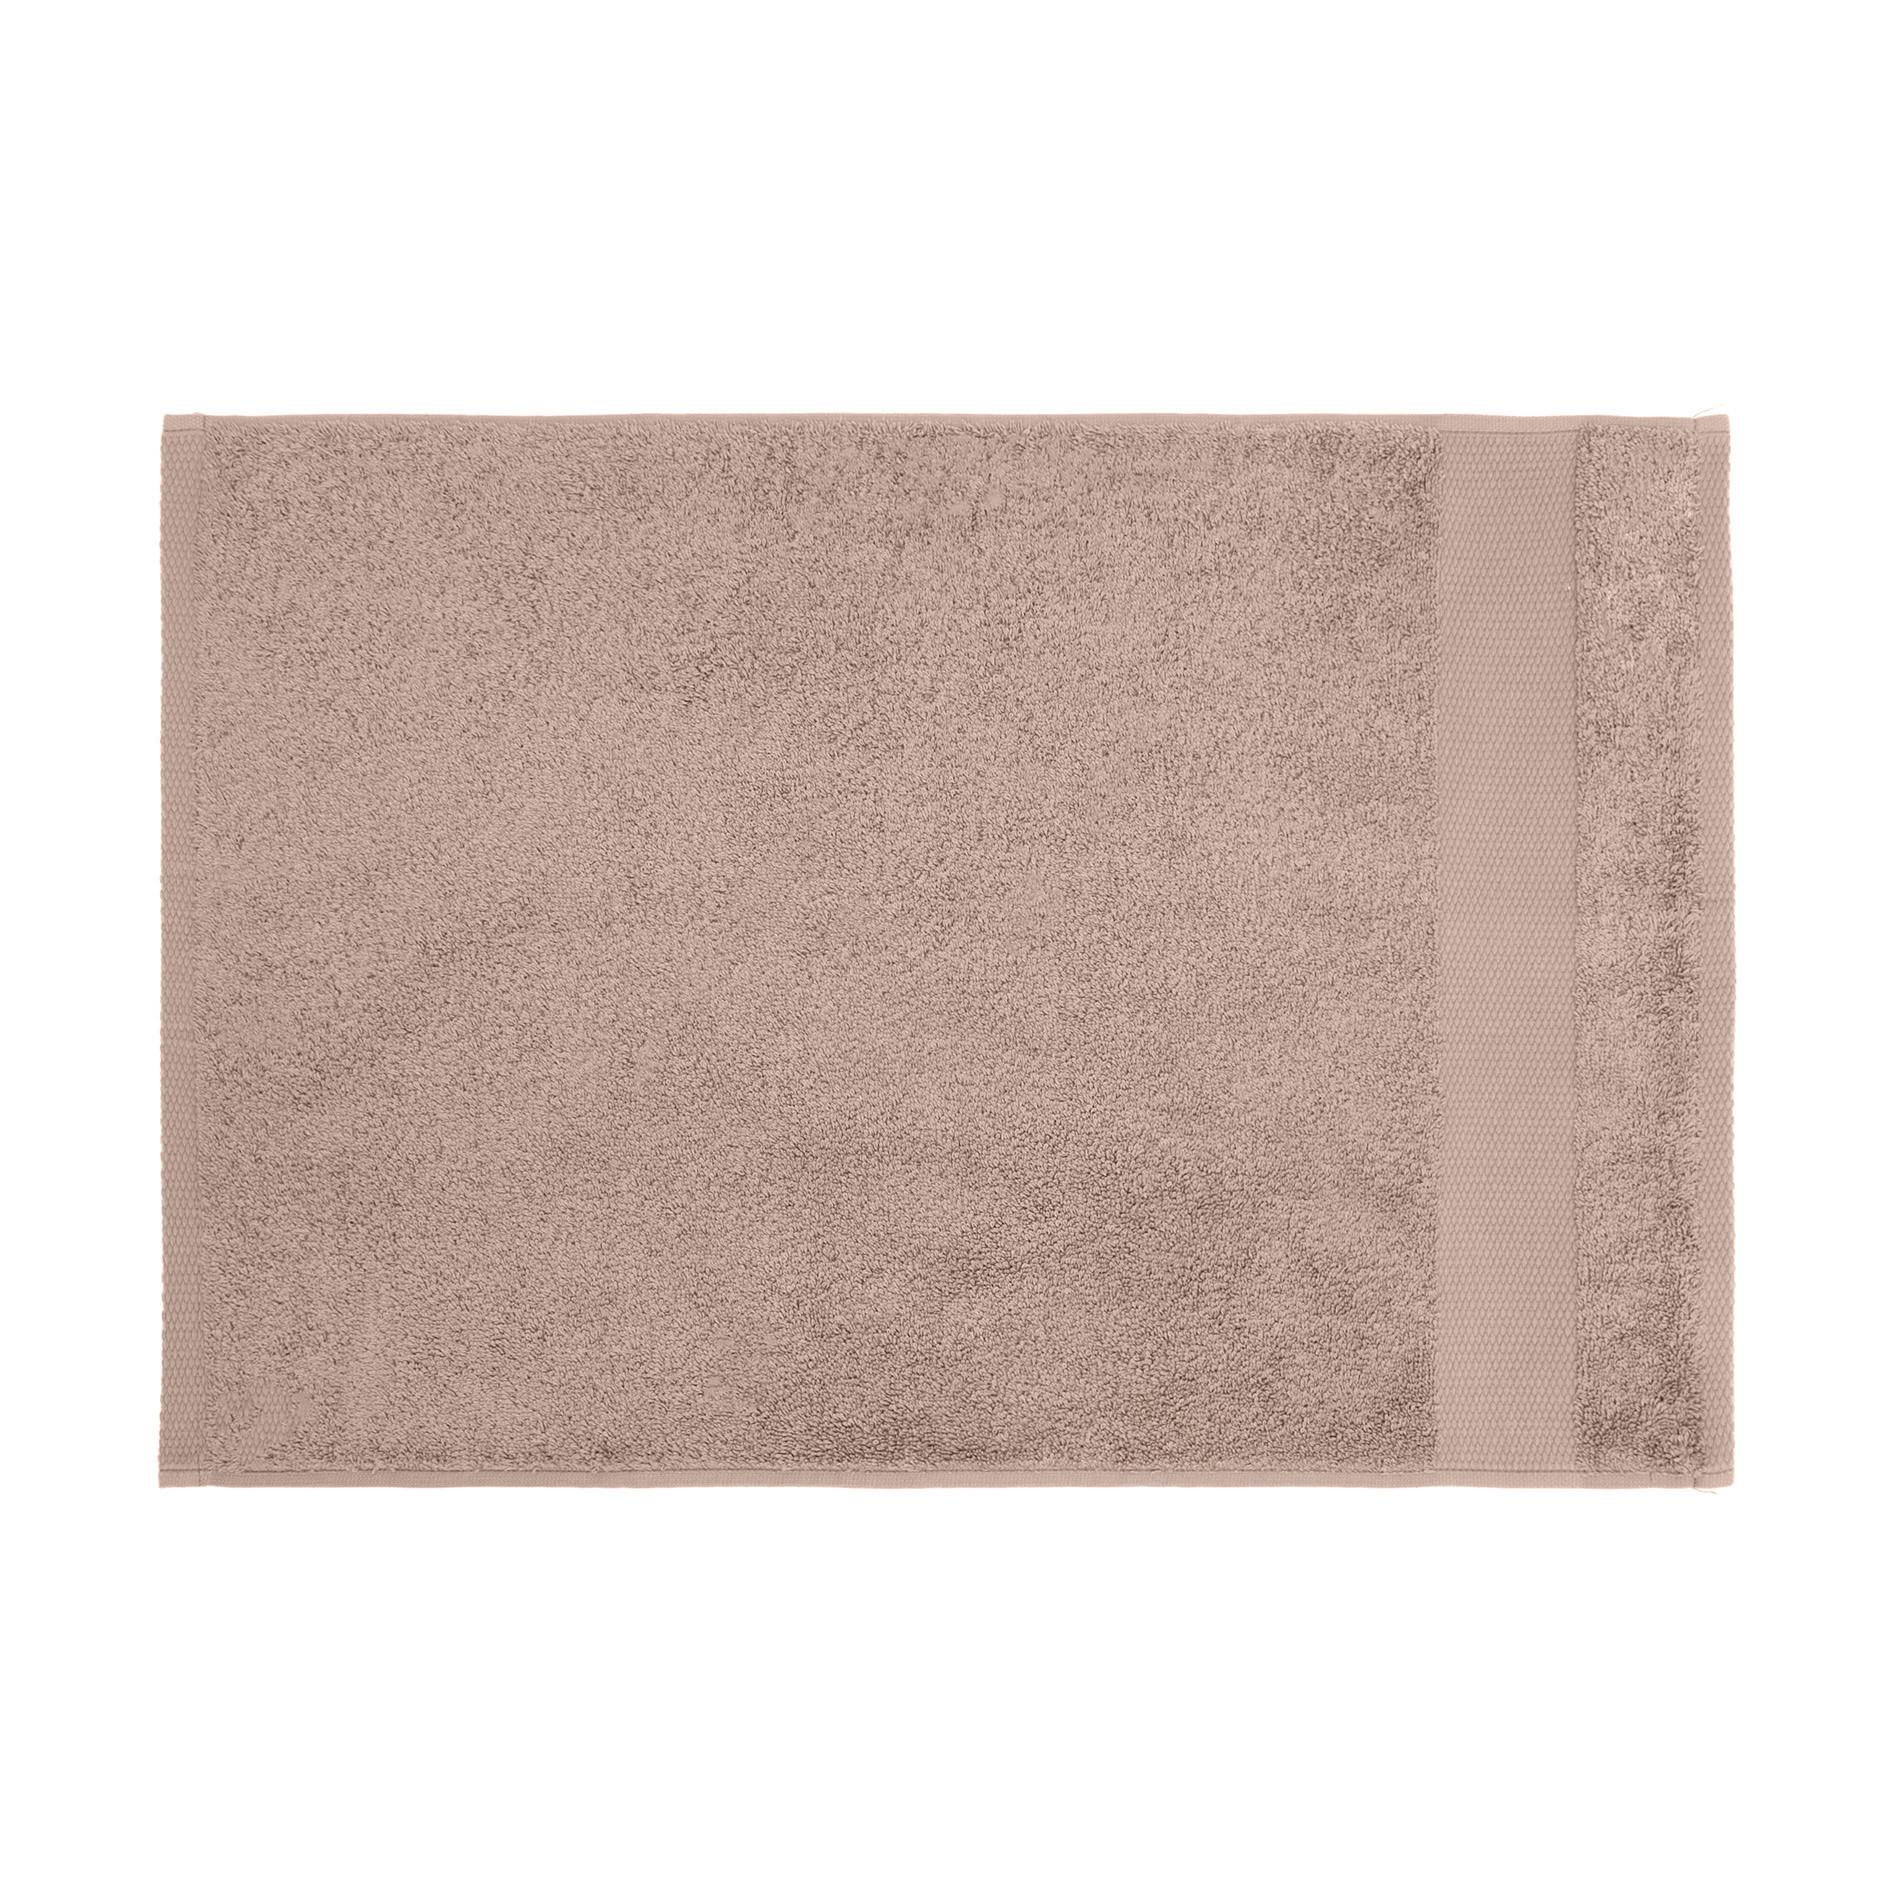 Asciugamano spugna di puro cotone Zefiro, Marrone, large image number 2